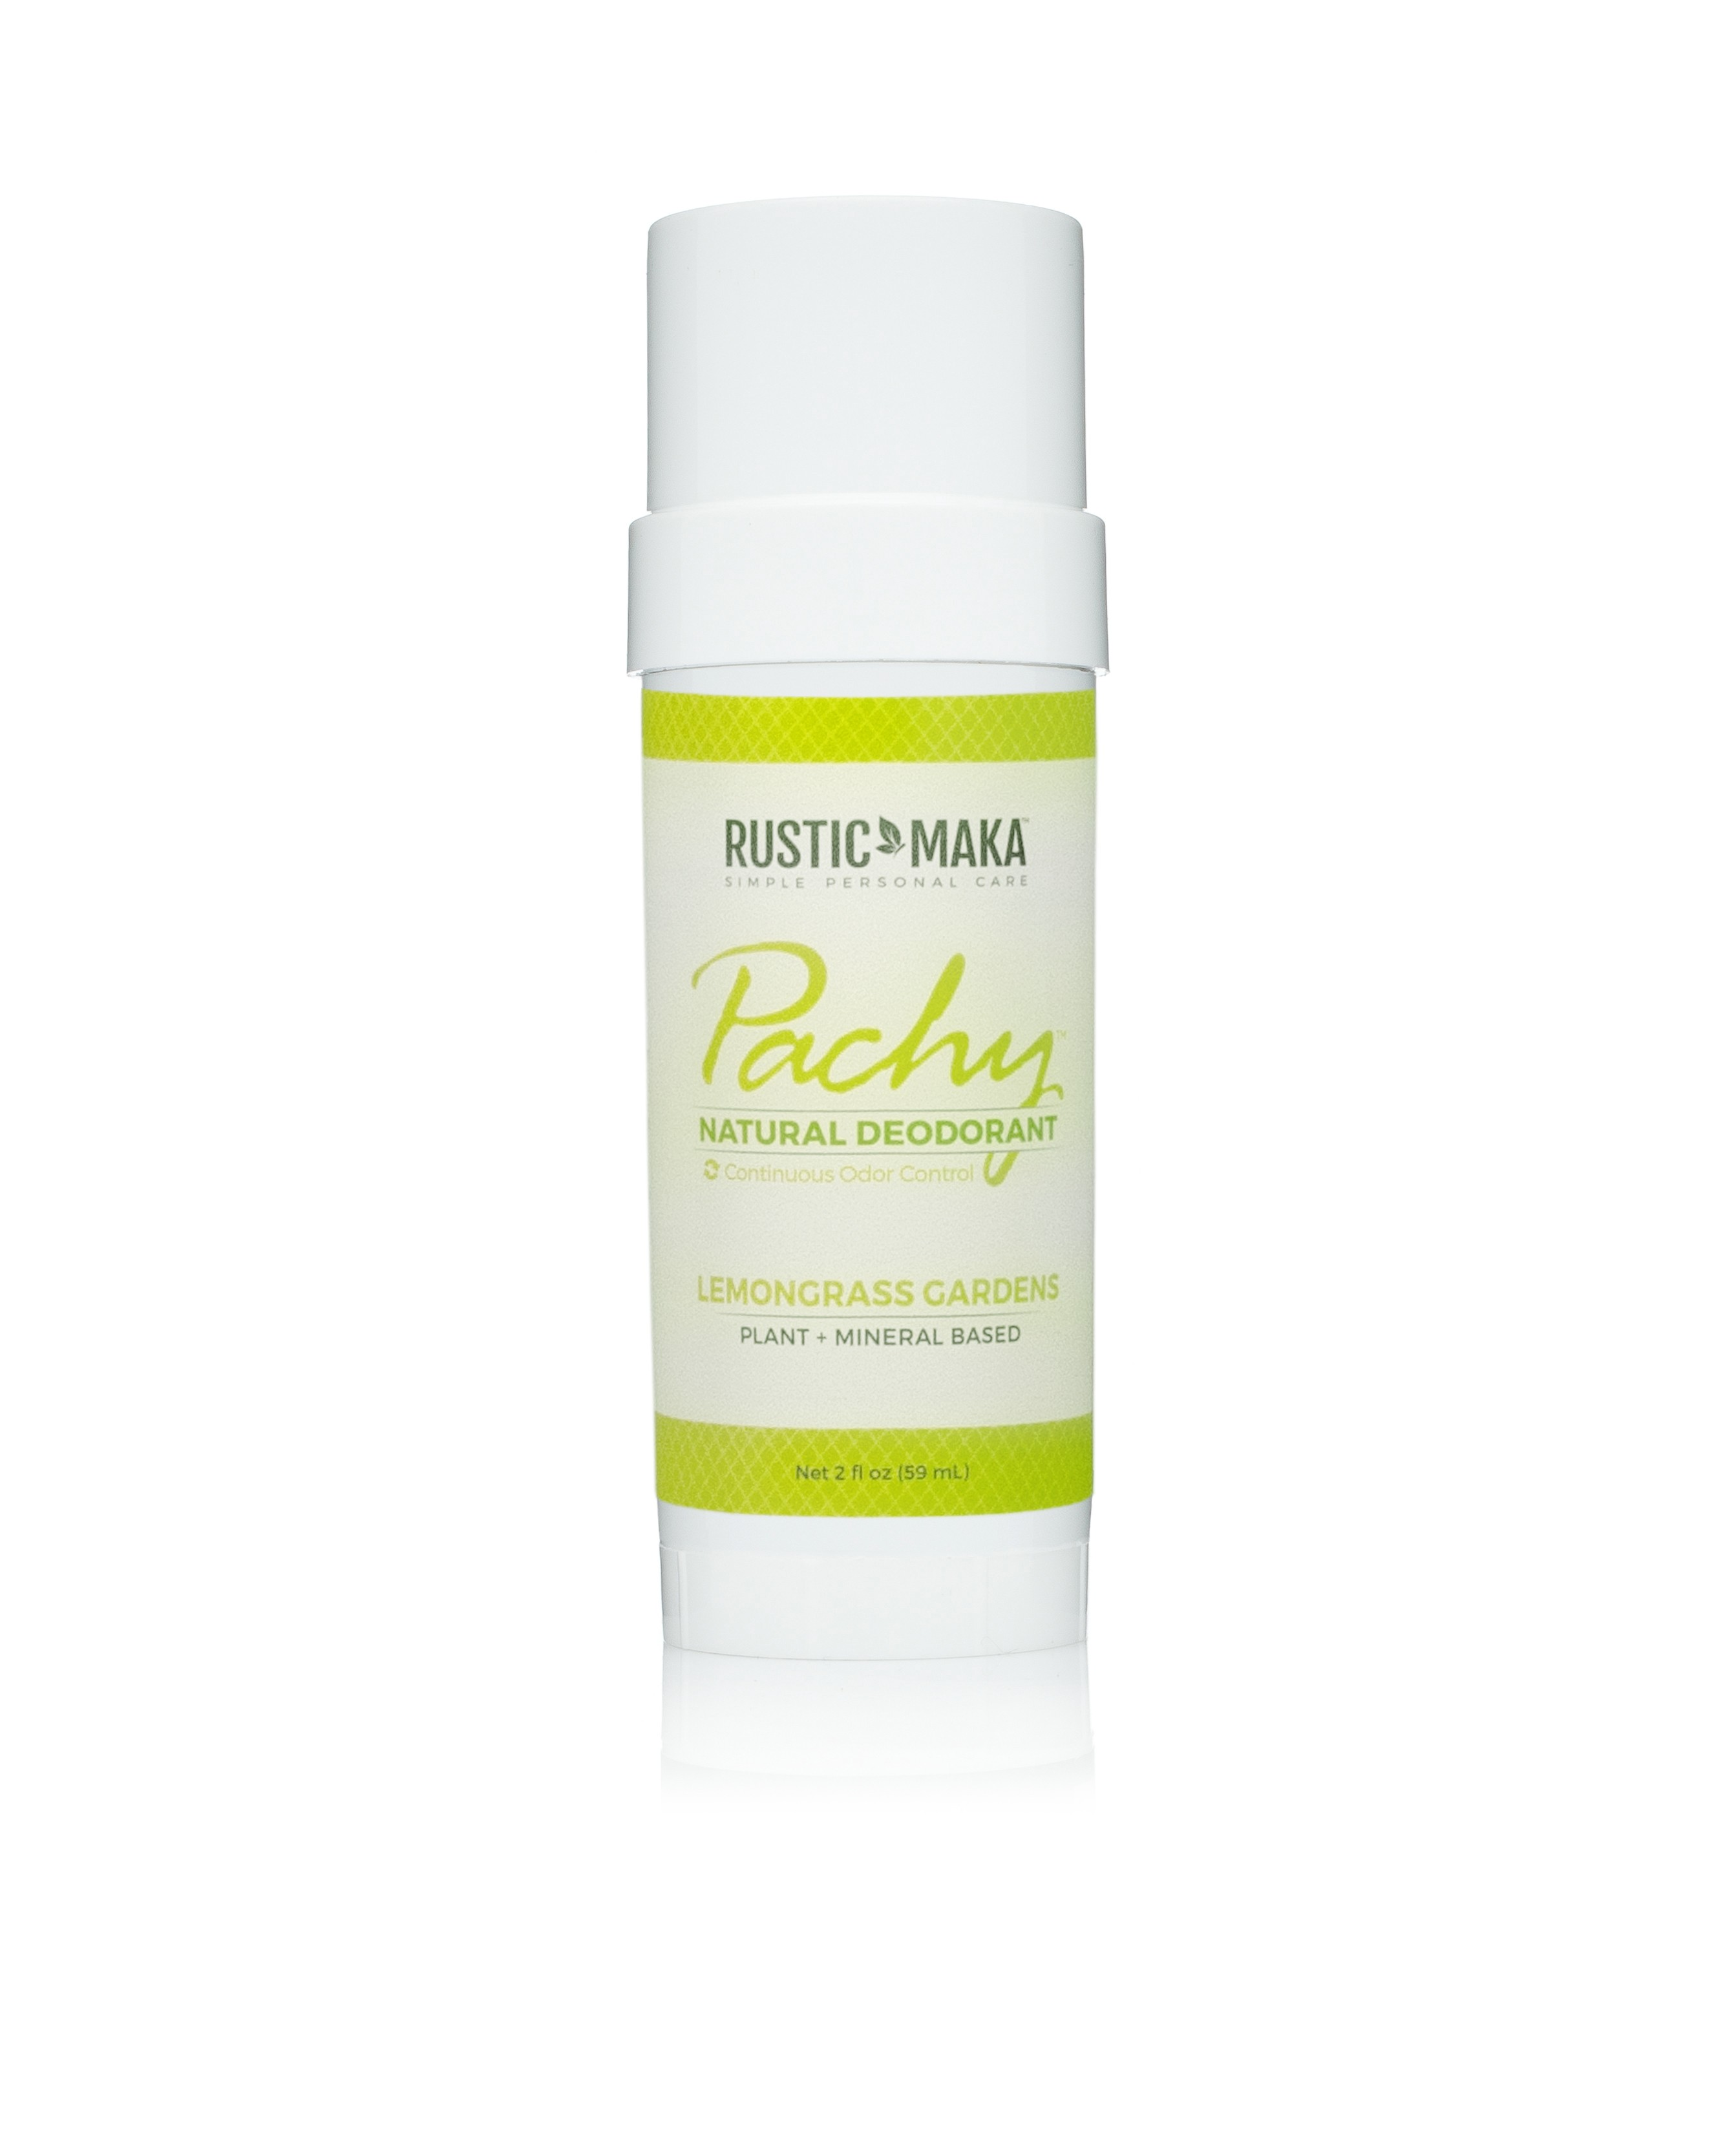 Rustic MAKA Pachy Natural Deodorant Lemongrass Gardens - Full Size